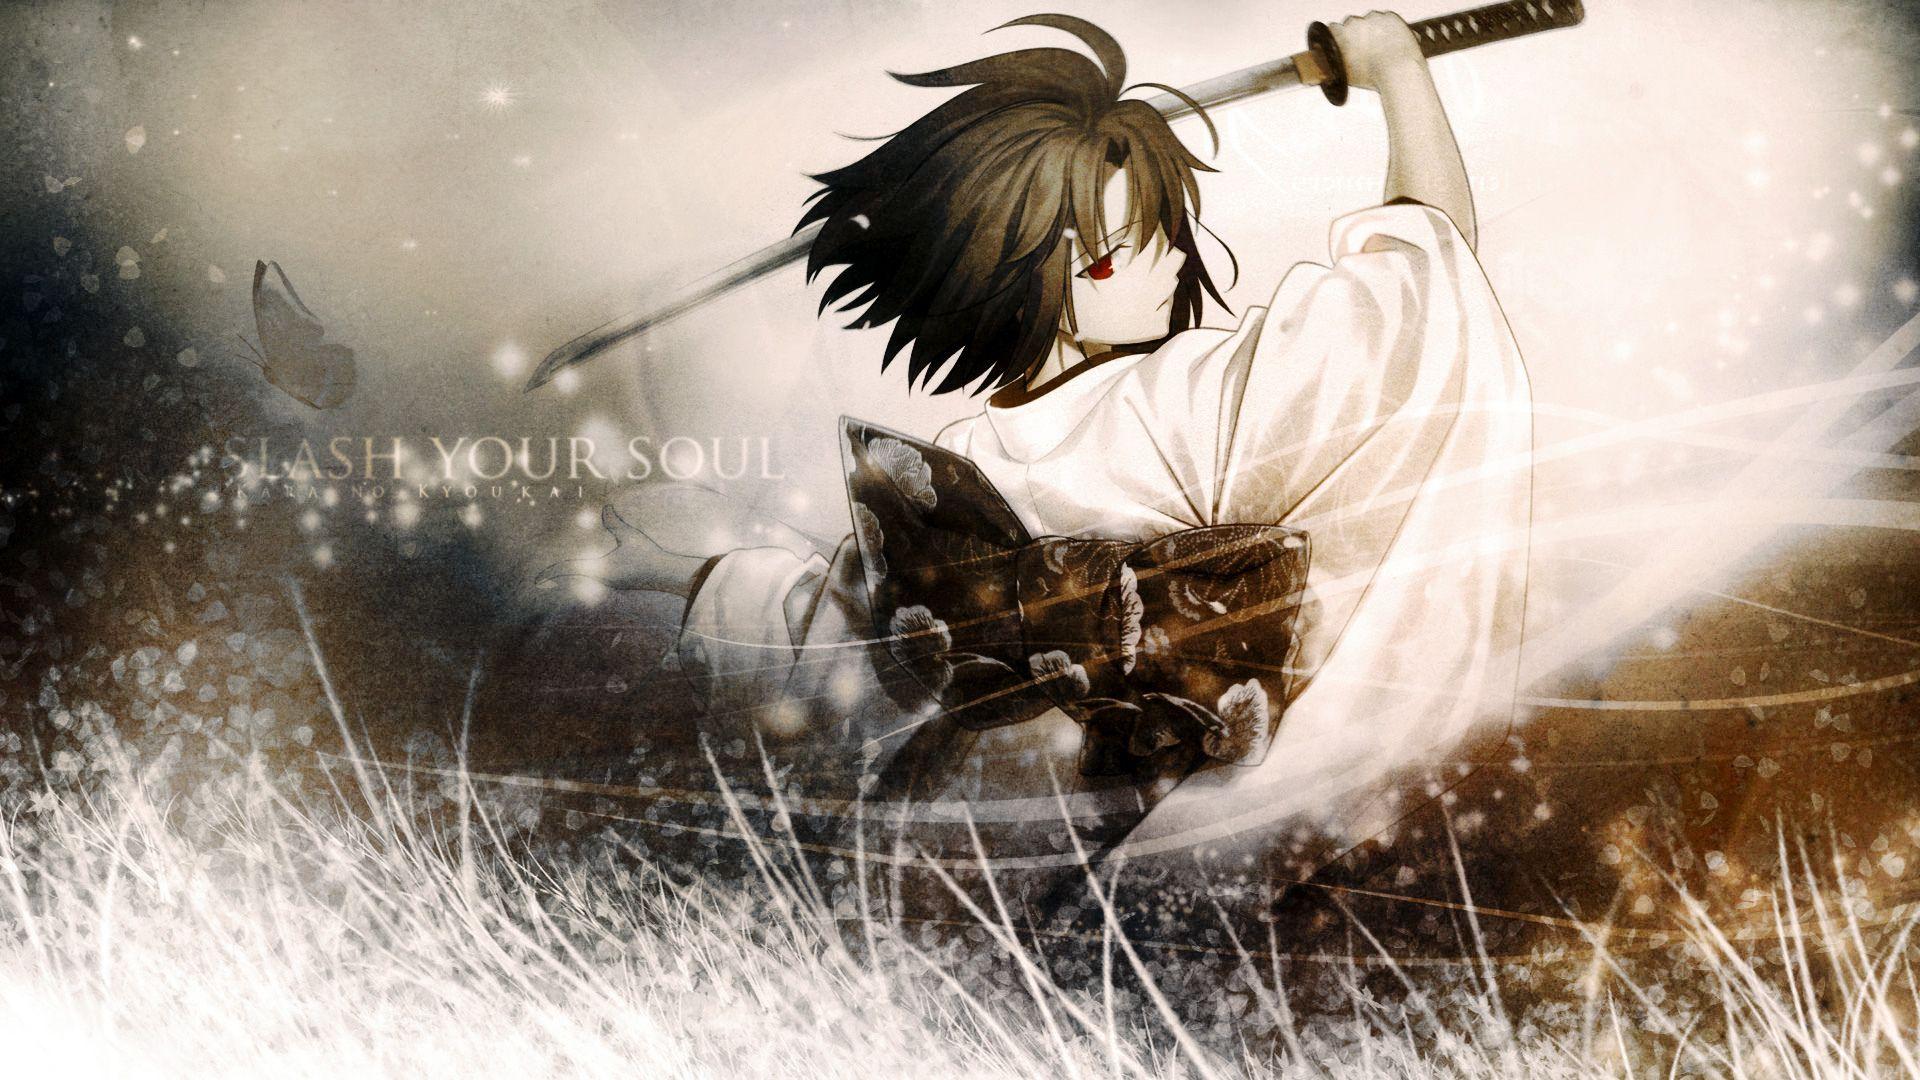 Anime Wallpapers Wallpaper Samurai Sword Gdefon Original Samuraj Anime Samurai Anime Anime Images